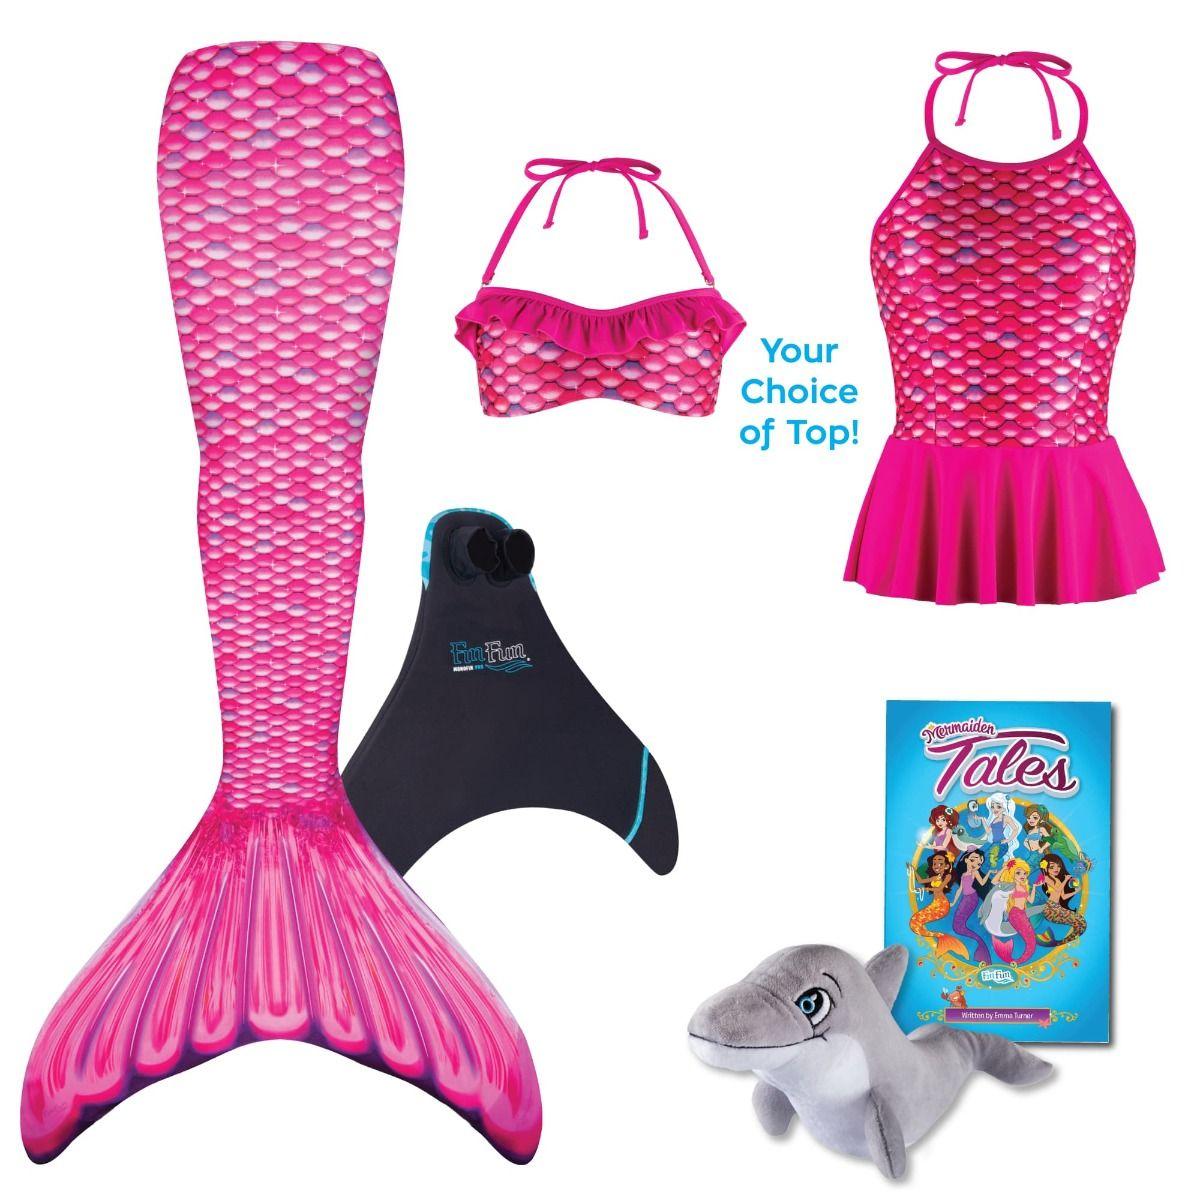 a41e1a131bfaf Mermaid Gifts for Kids | Malibu Pink Mermaid Tail Gift Set | Fin Fun